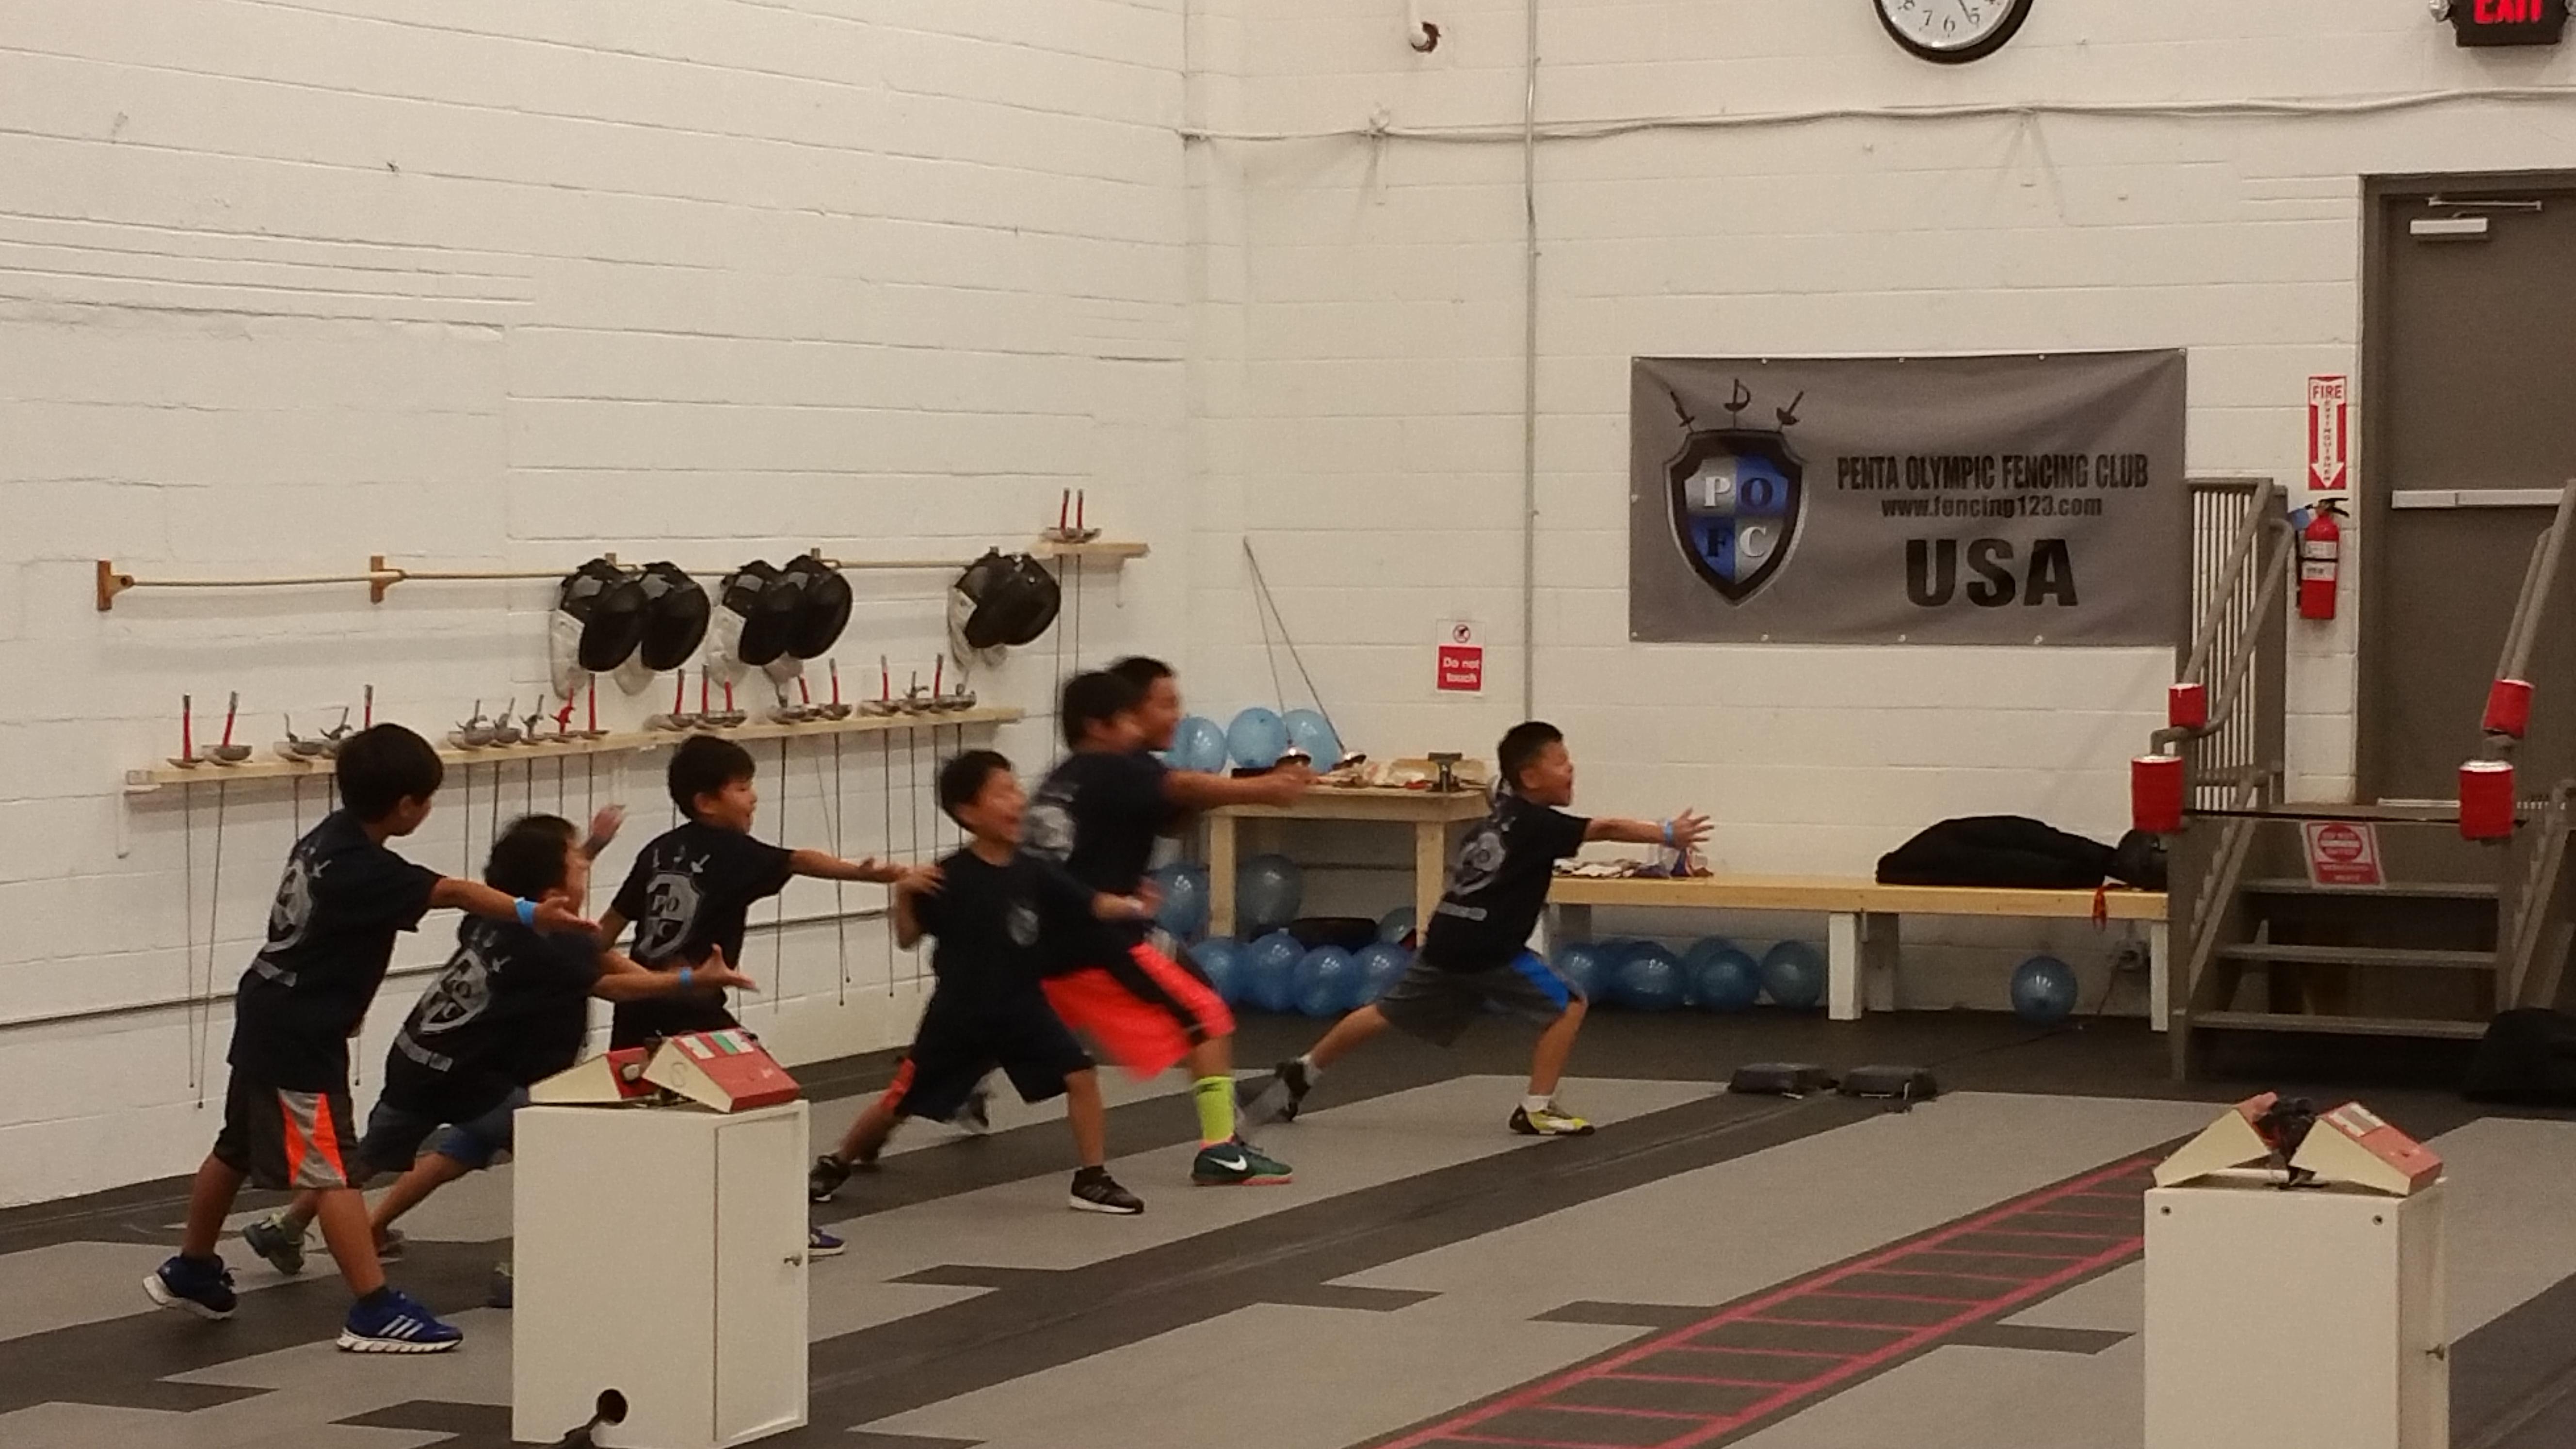 Penta Olympic Fencing Club Fairfax Va